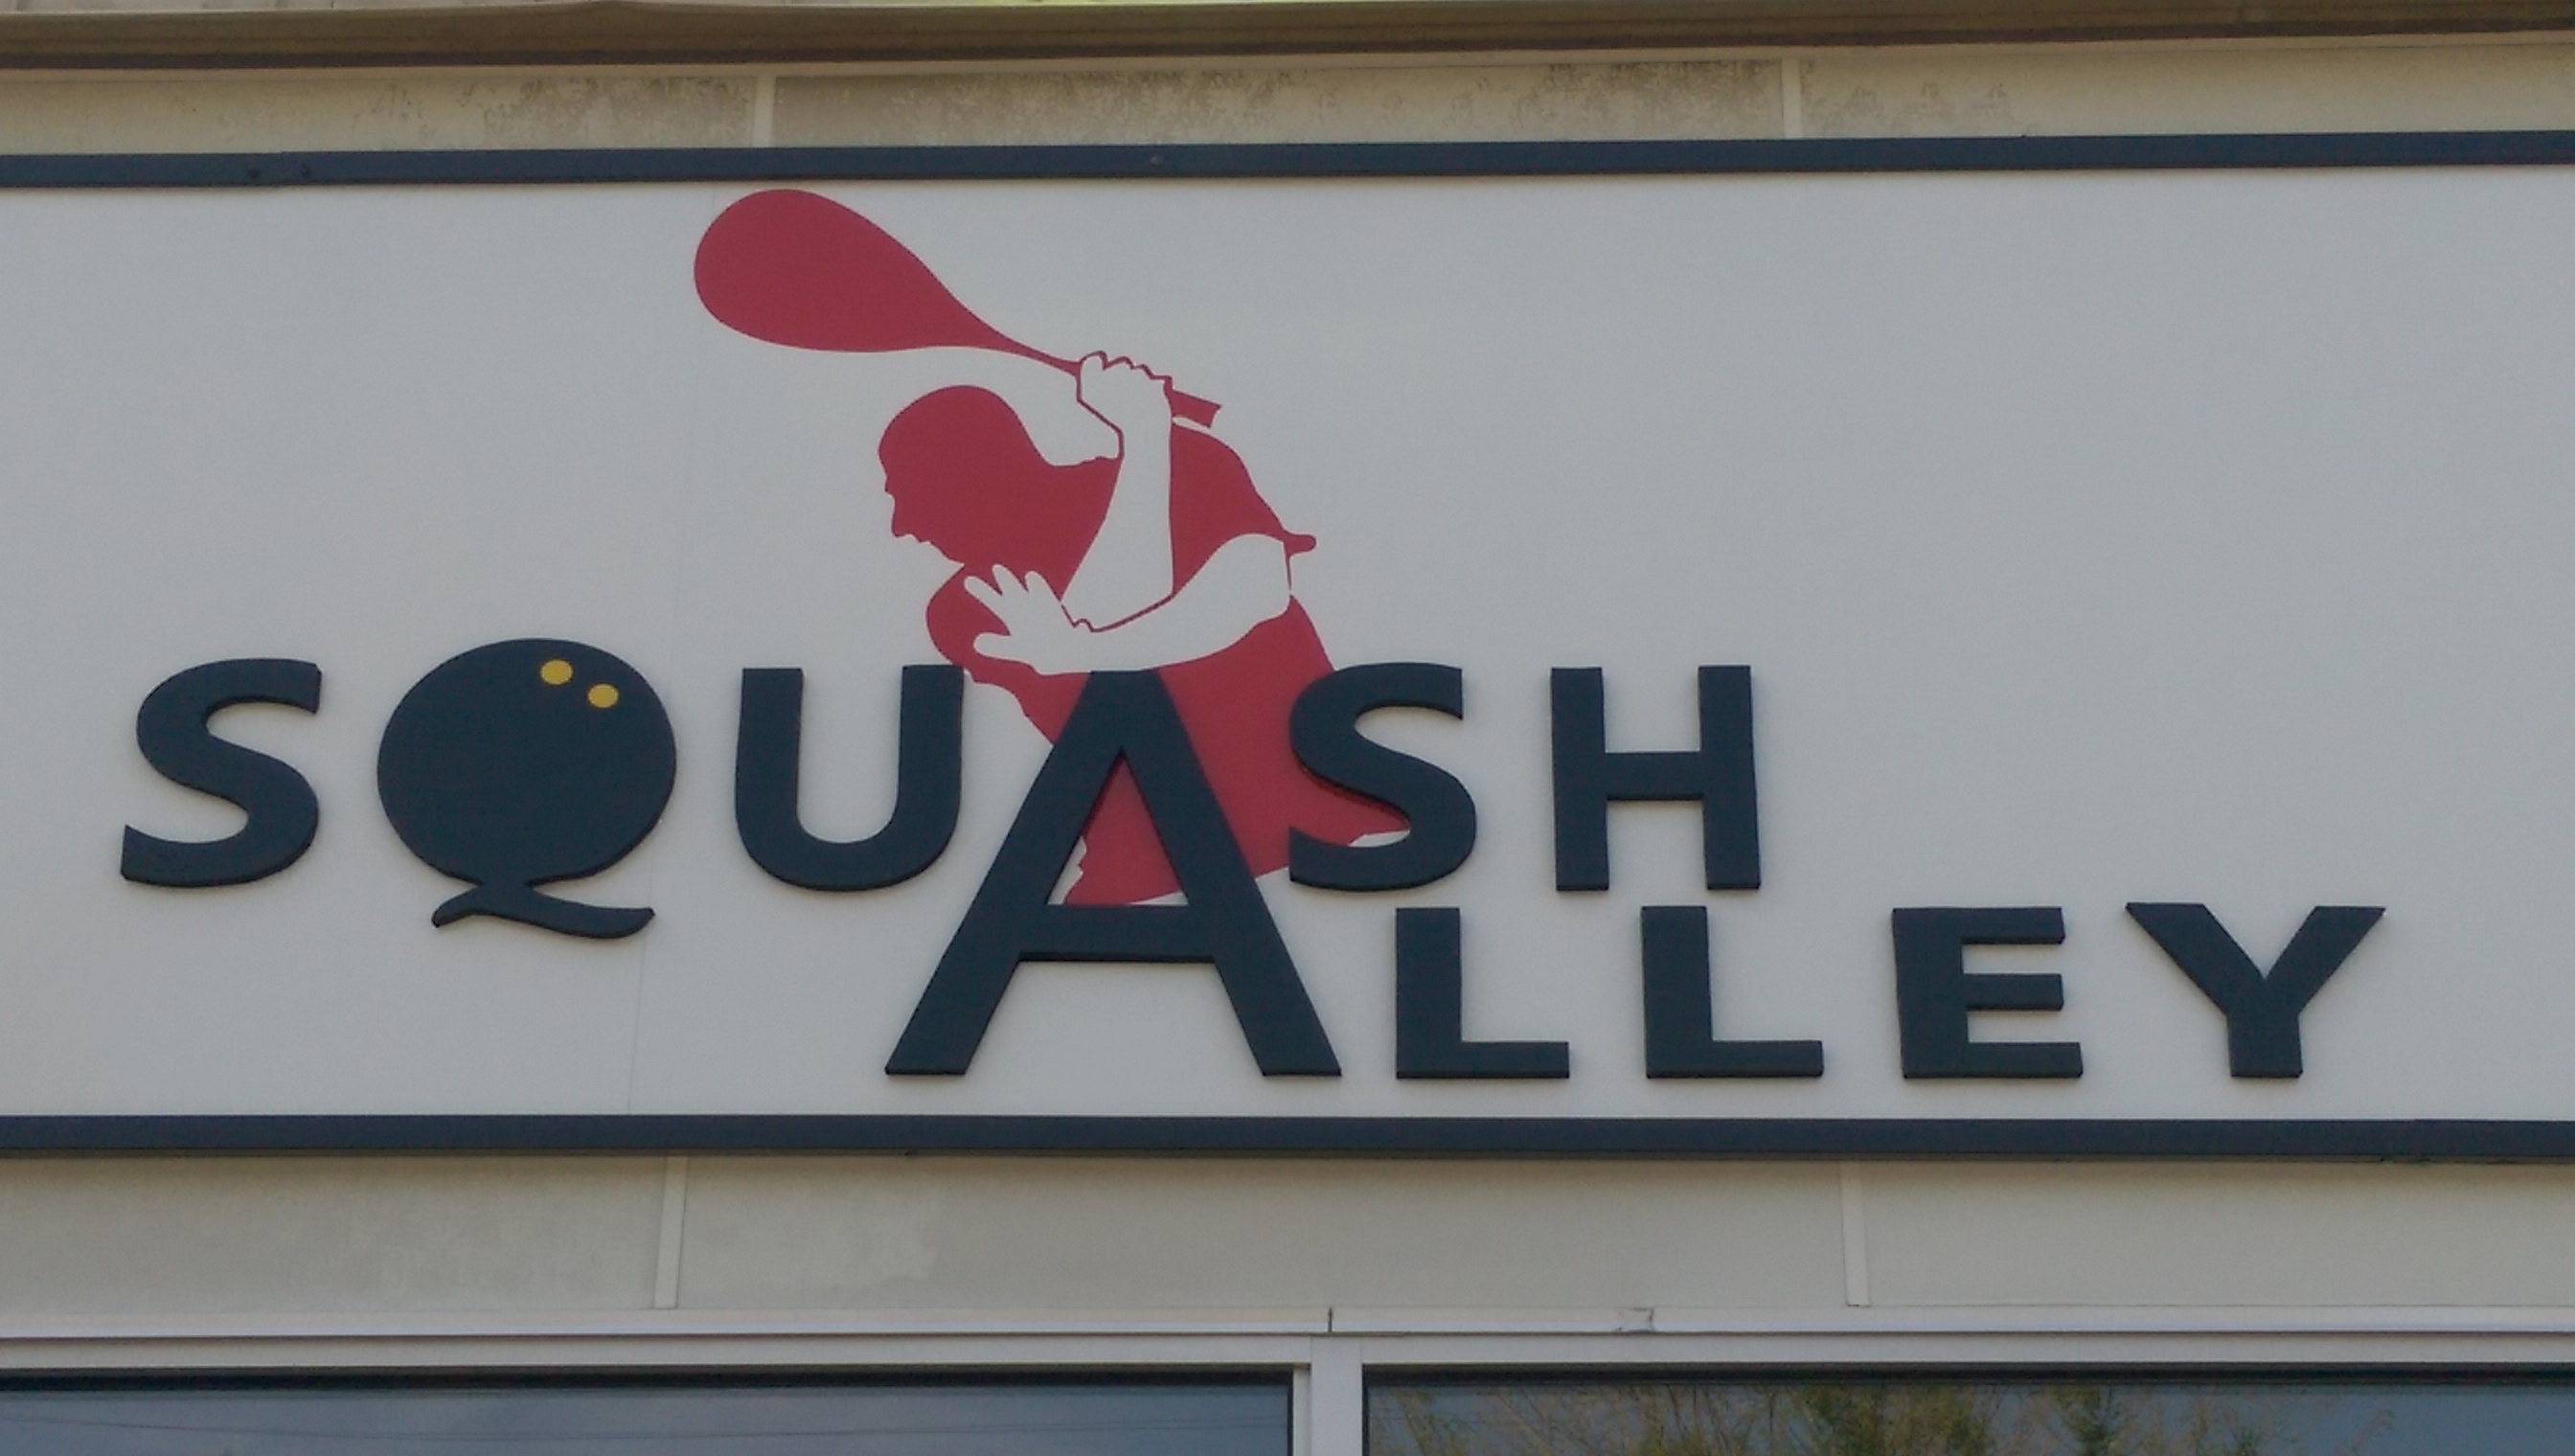 Squash Alley Stamford